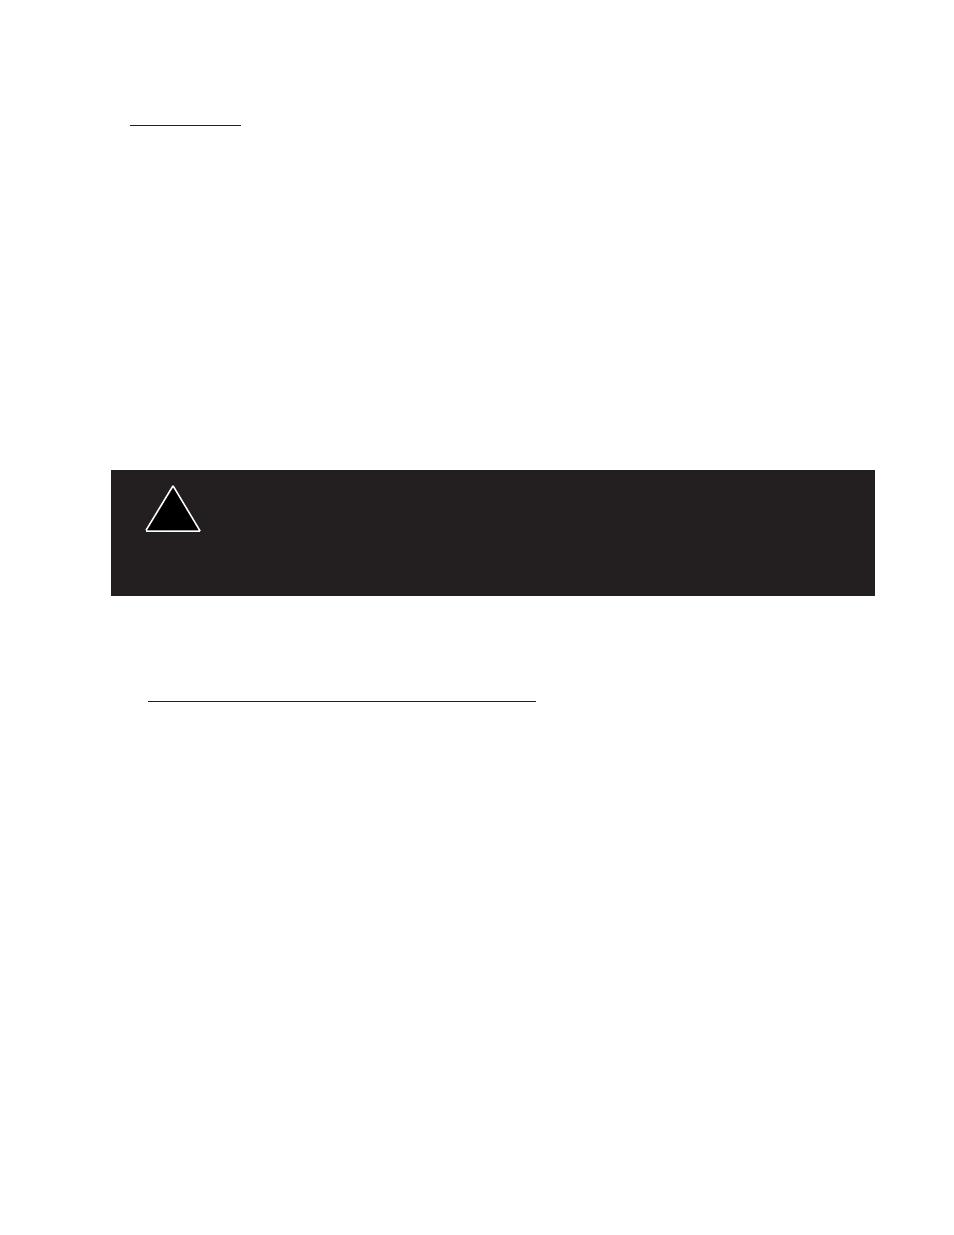 warning code 3 mx 7000 user manual page 9 32. Black Bedroom Furniture Sets. Home Design Ideas